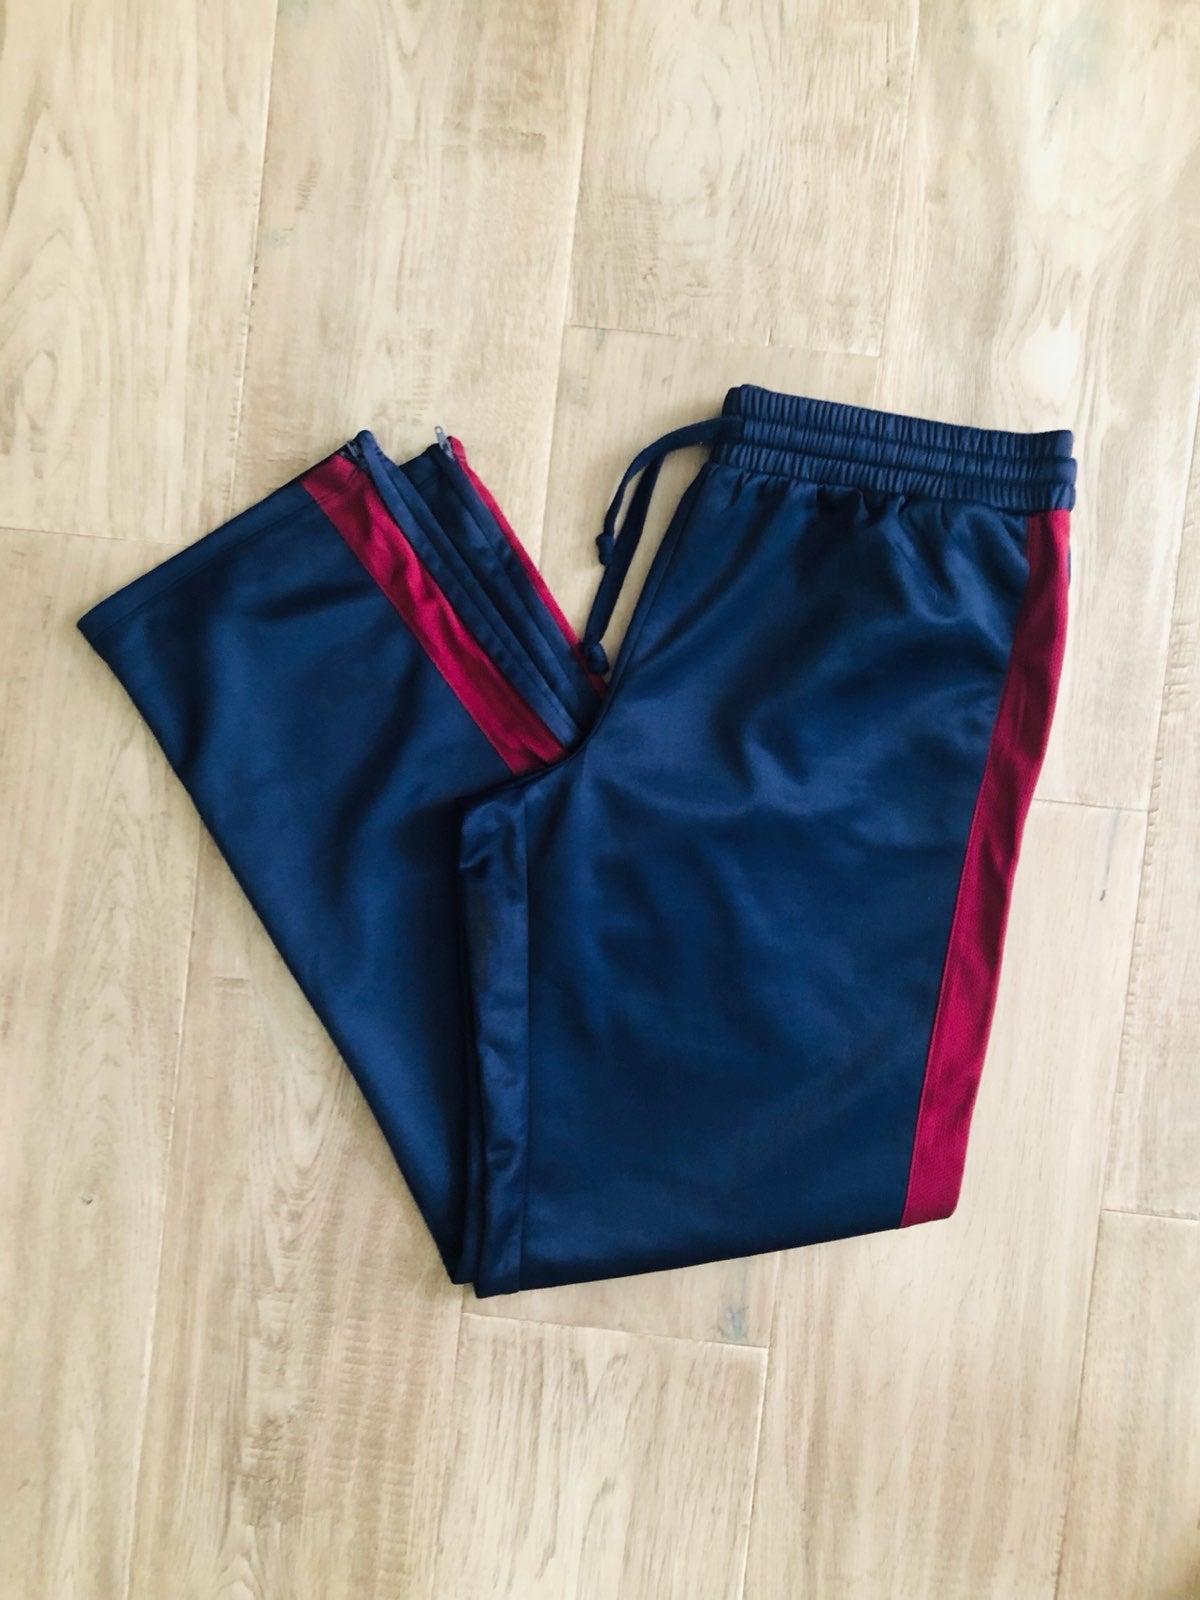 Women's navy blue active pants size Larg